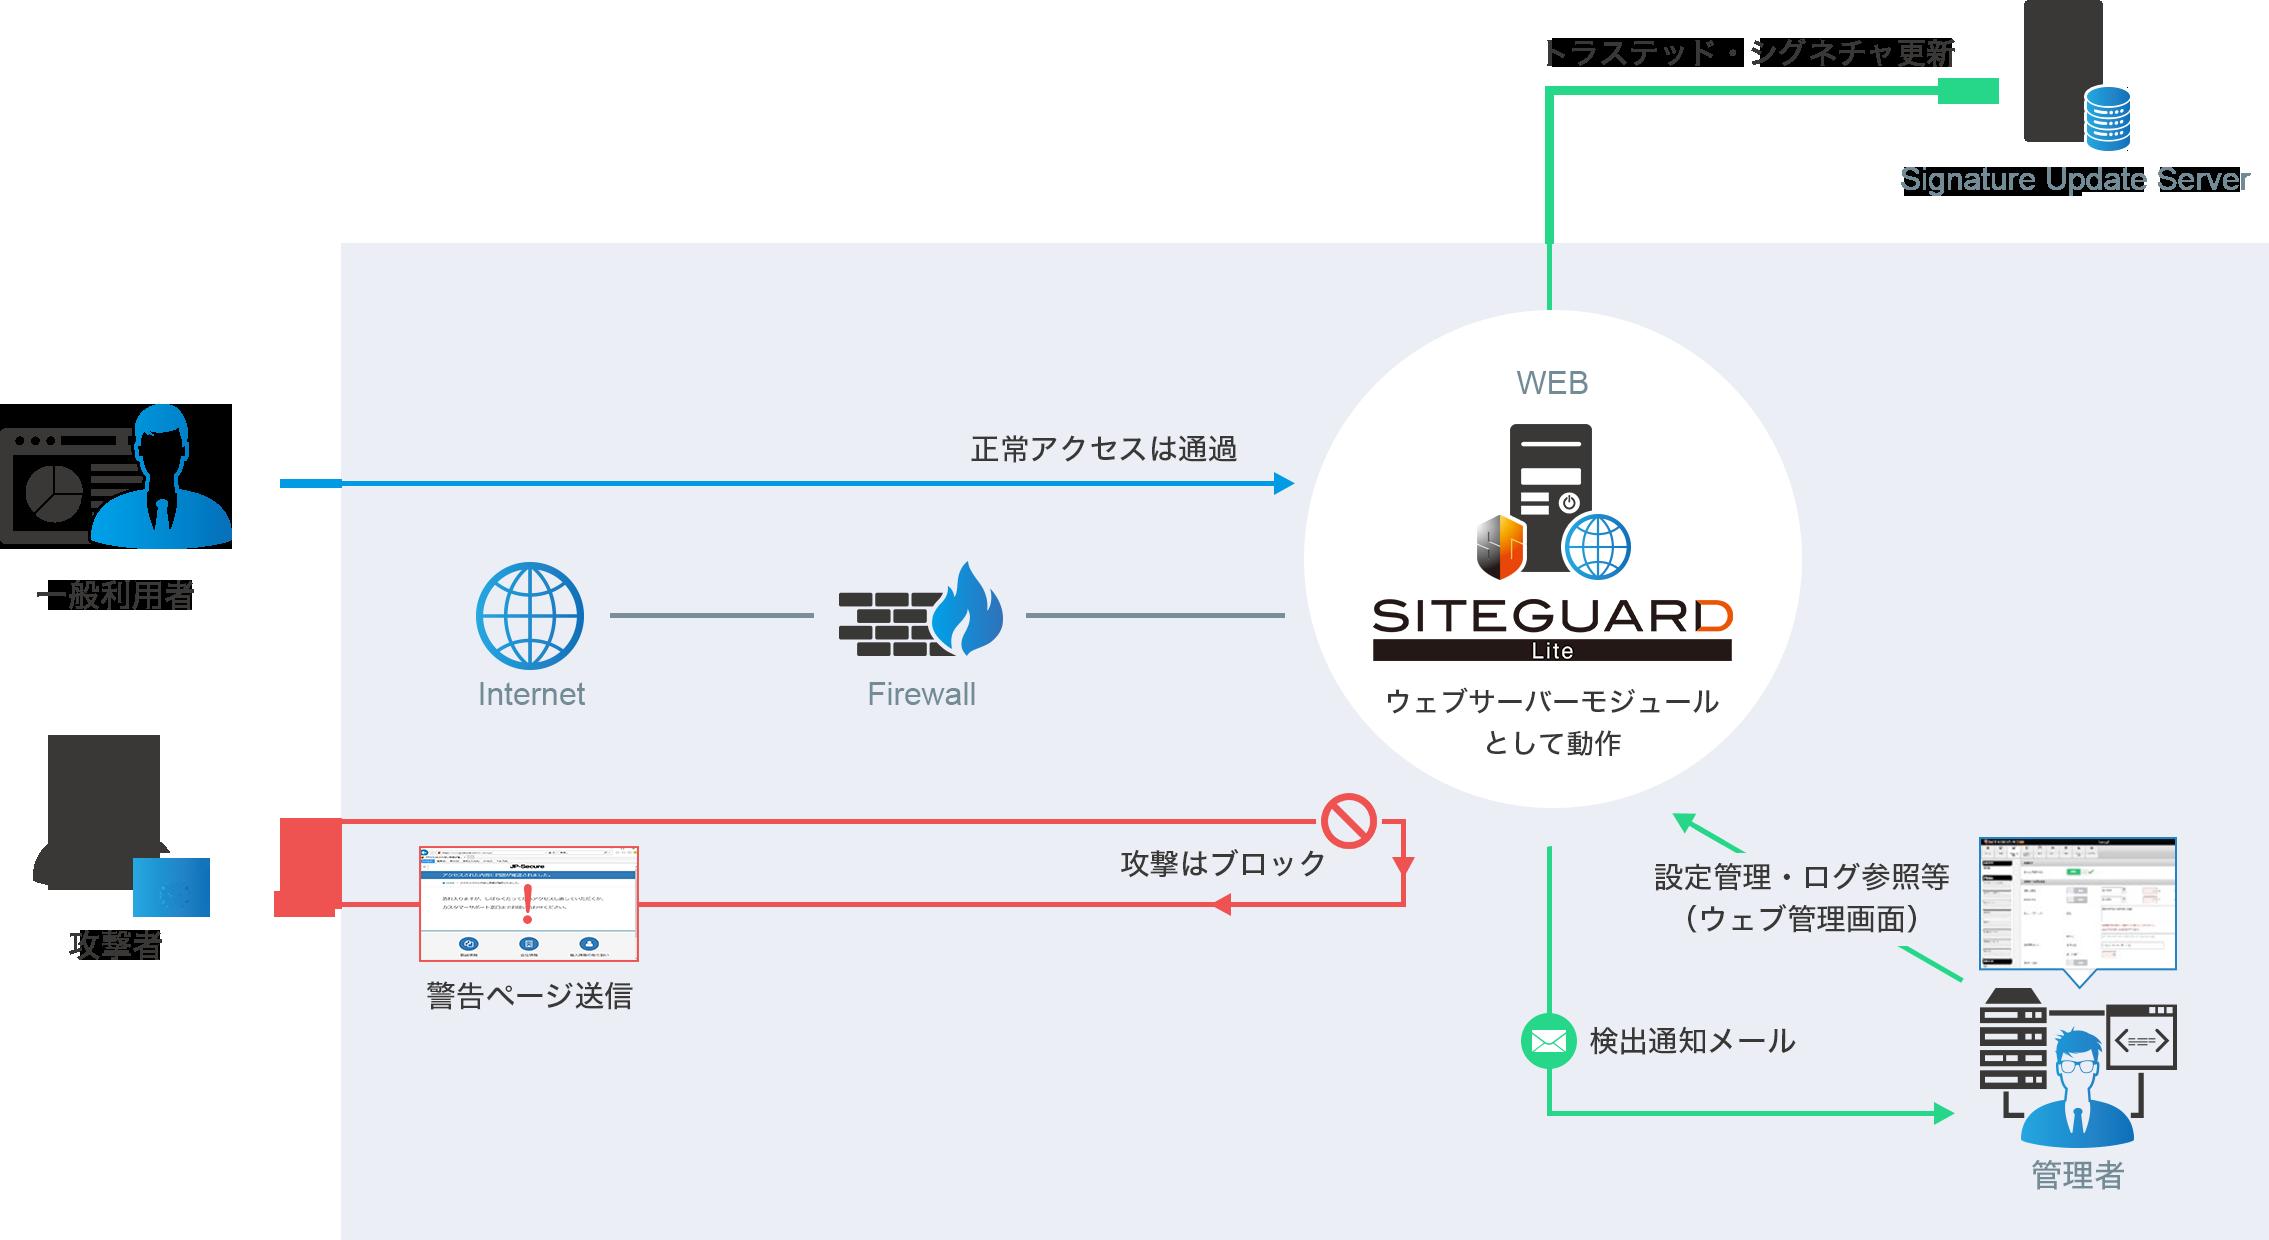 SiteGuard Lite概要